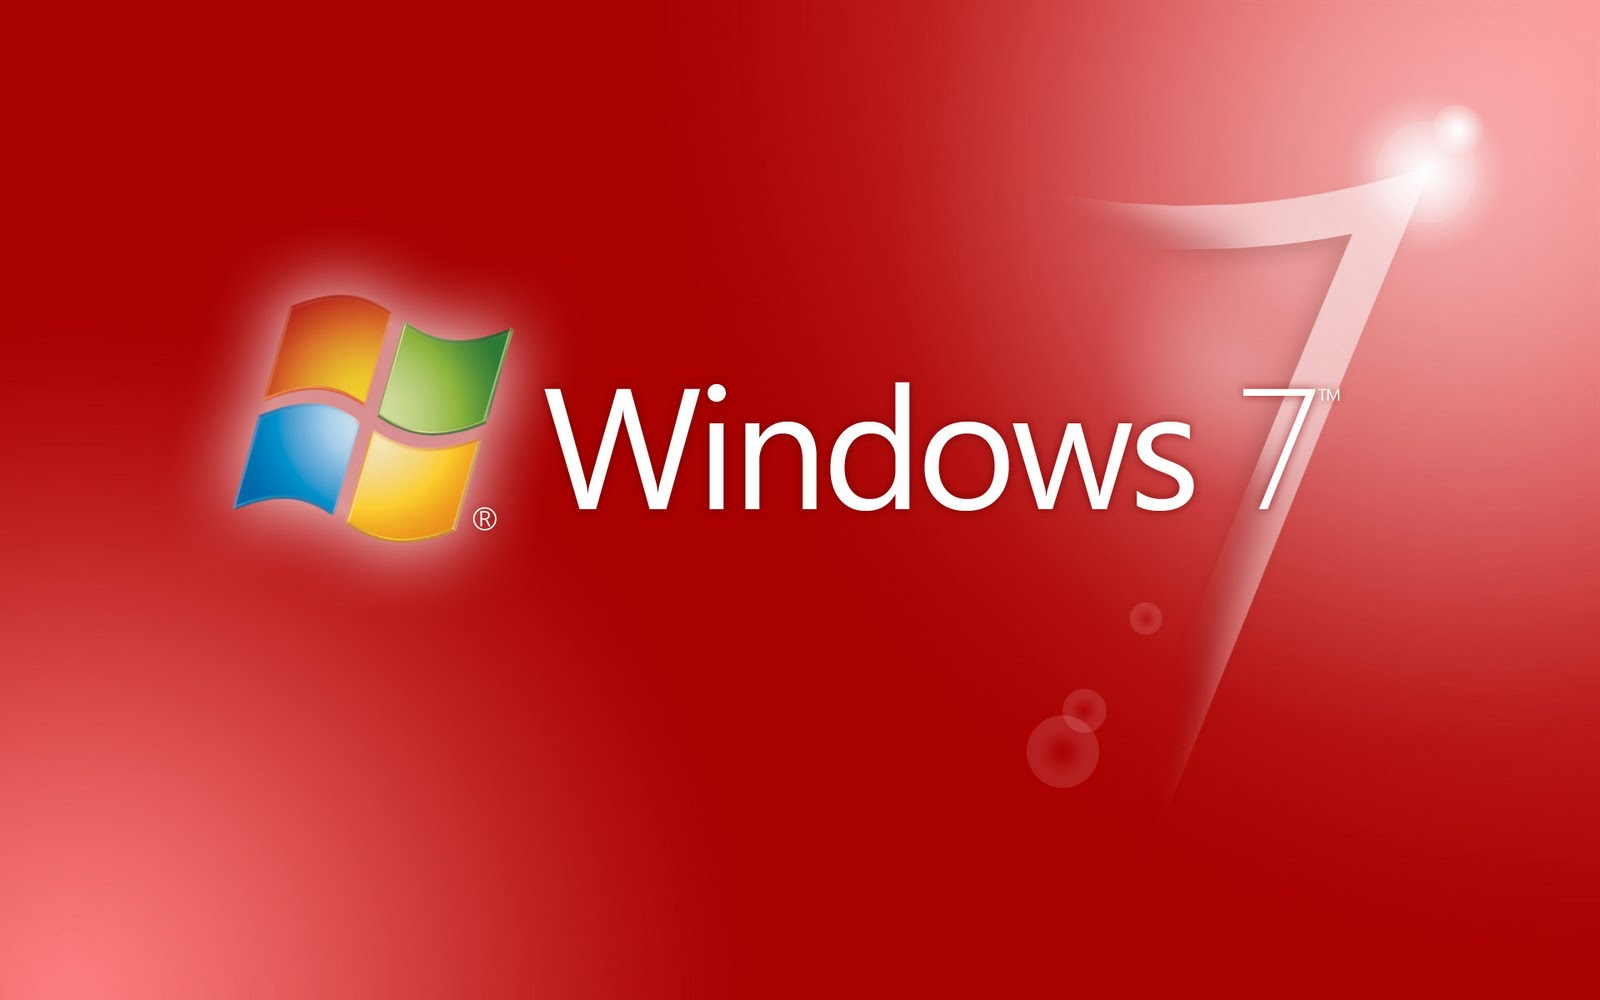 http://3.bp.blogspot.com/_Qc6aMdLT994/S6pU26QX7AI/AAAAAAAAFGM/8AHp9OzYttU/s1600/Windows%2B7%2Bultimate%2Bcollection%2Bof%2Bwallpapers%2B(3).jpg